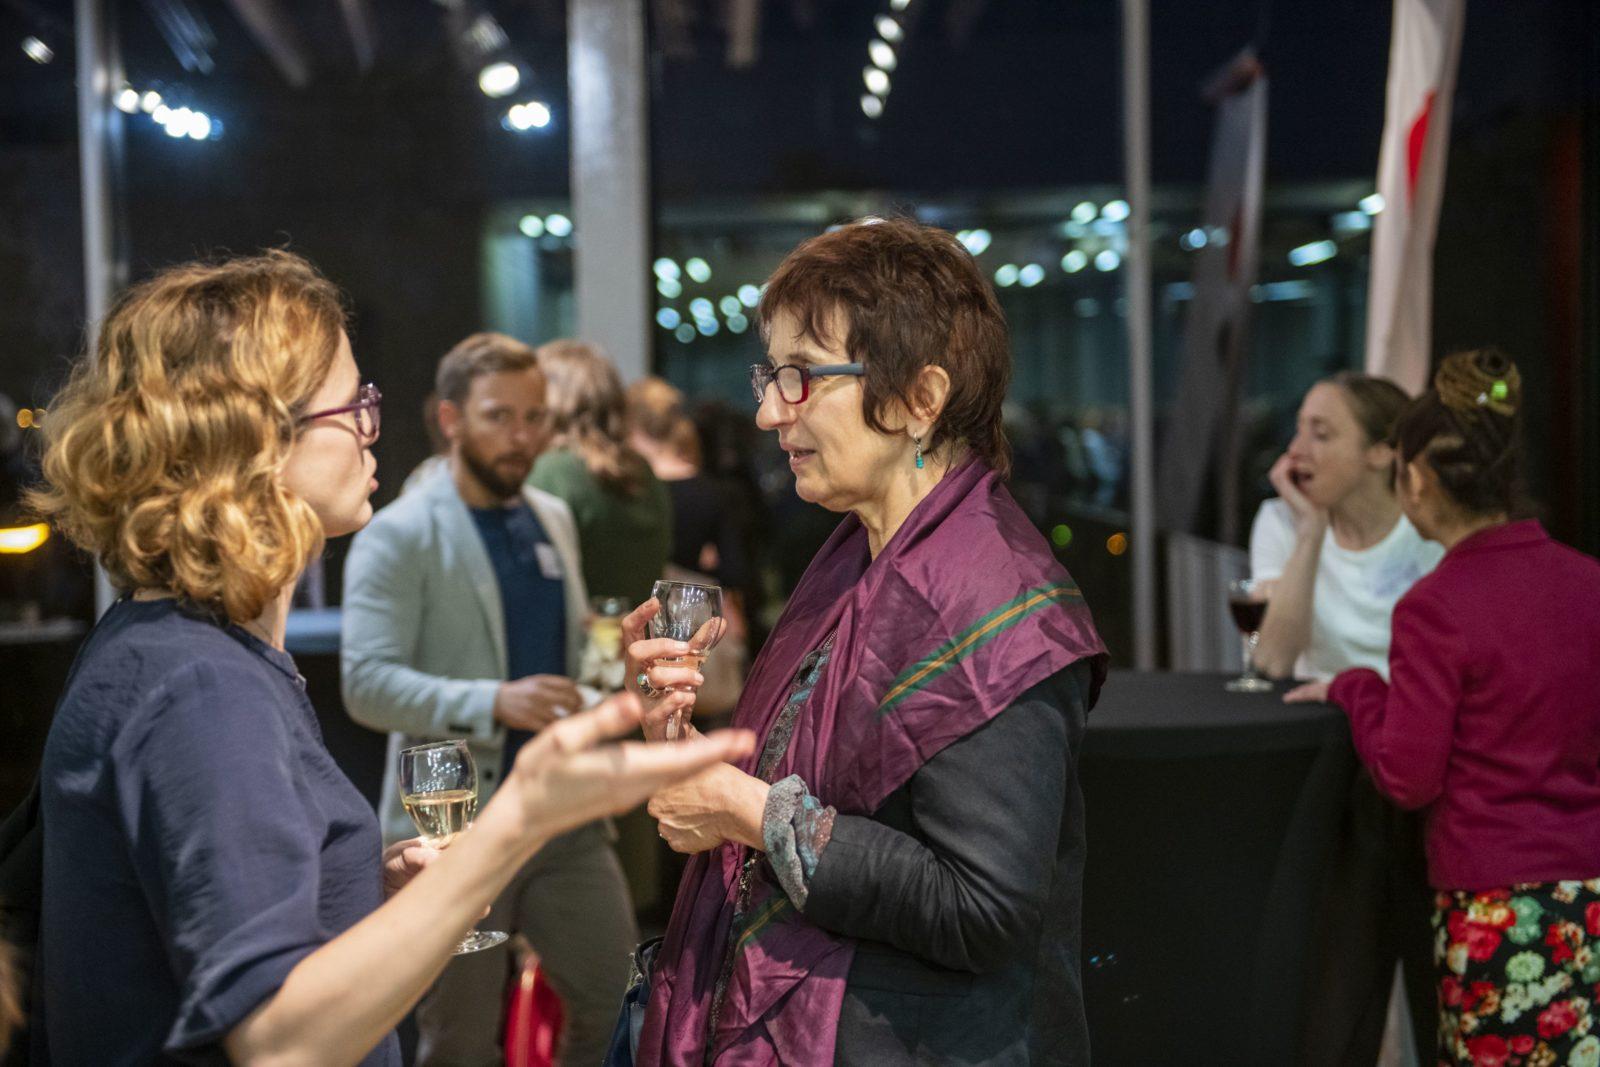 Warschau_2019_Empfang_reception_Thursday_Warsaw_Stasiuk_Konrad_263